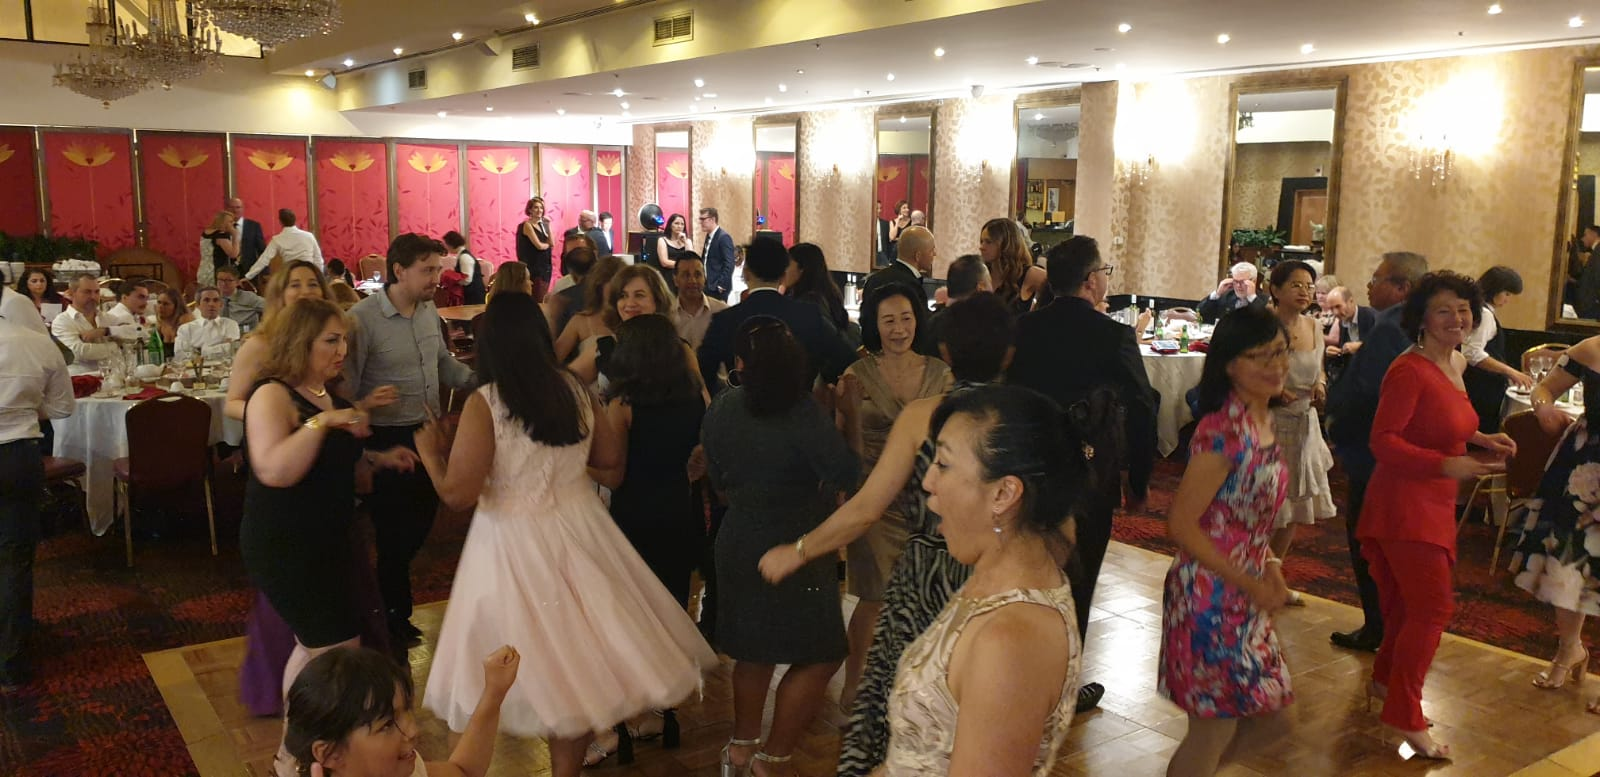 daisi ball dancing